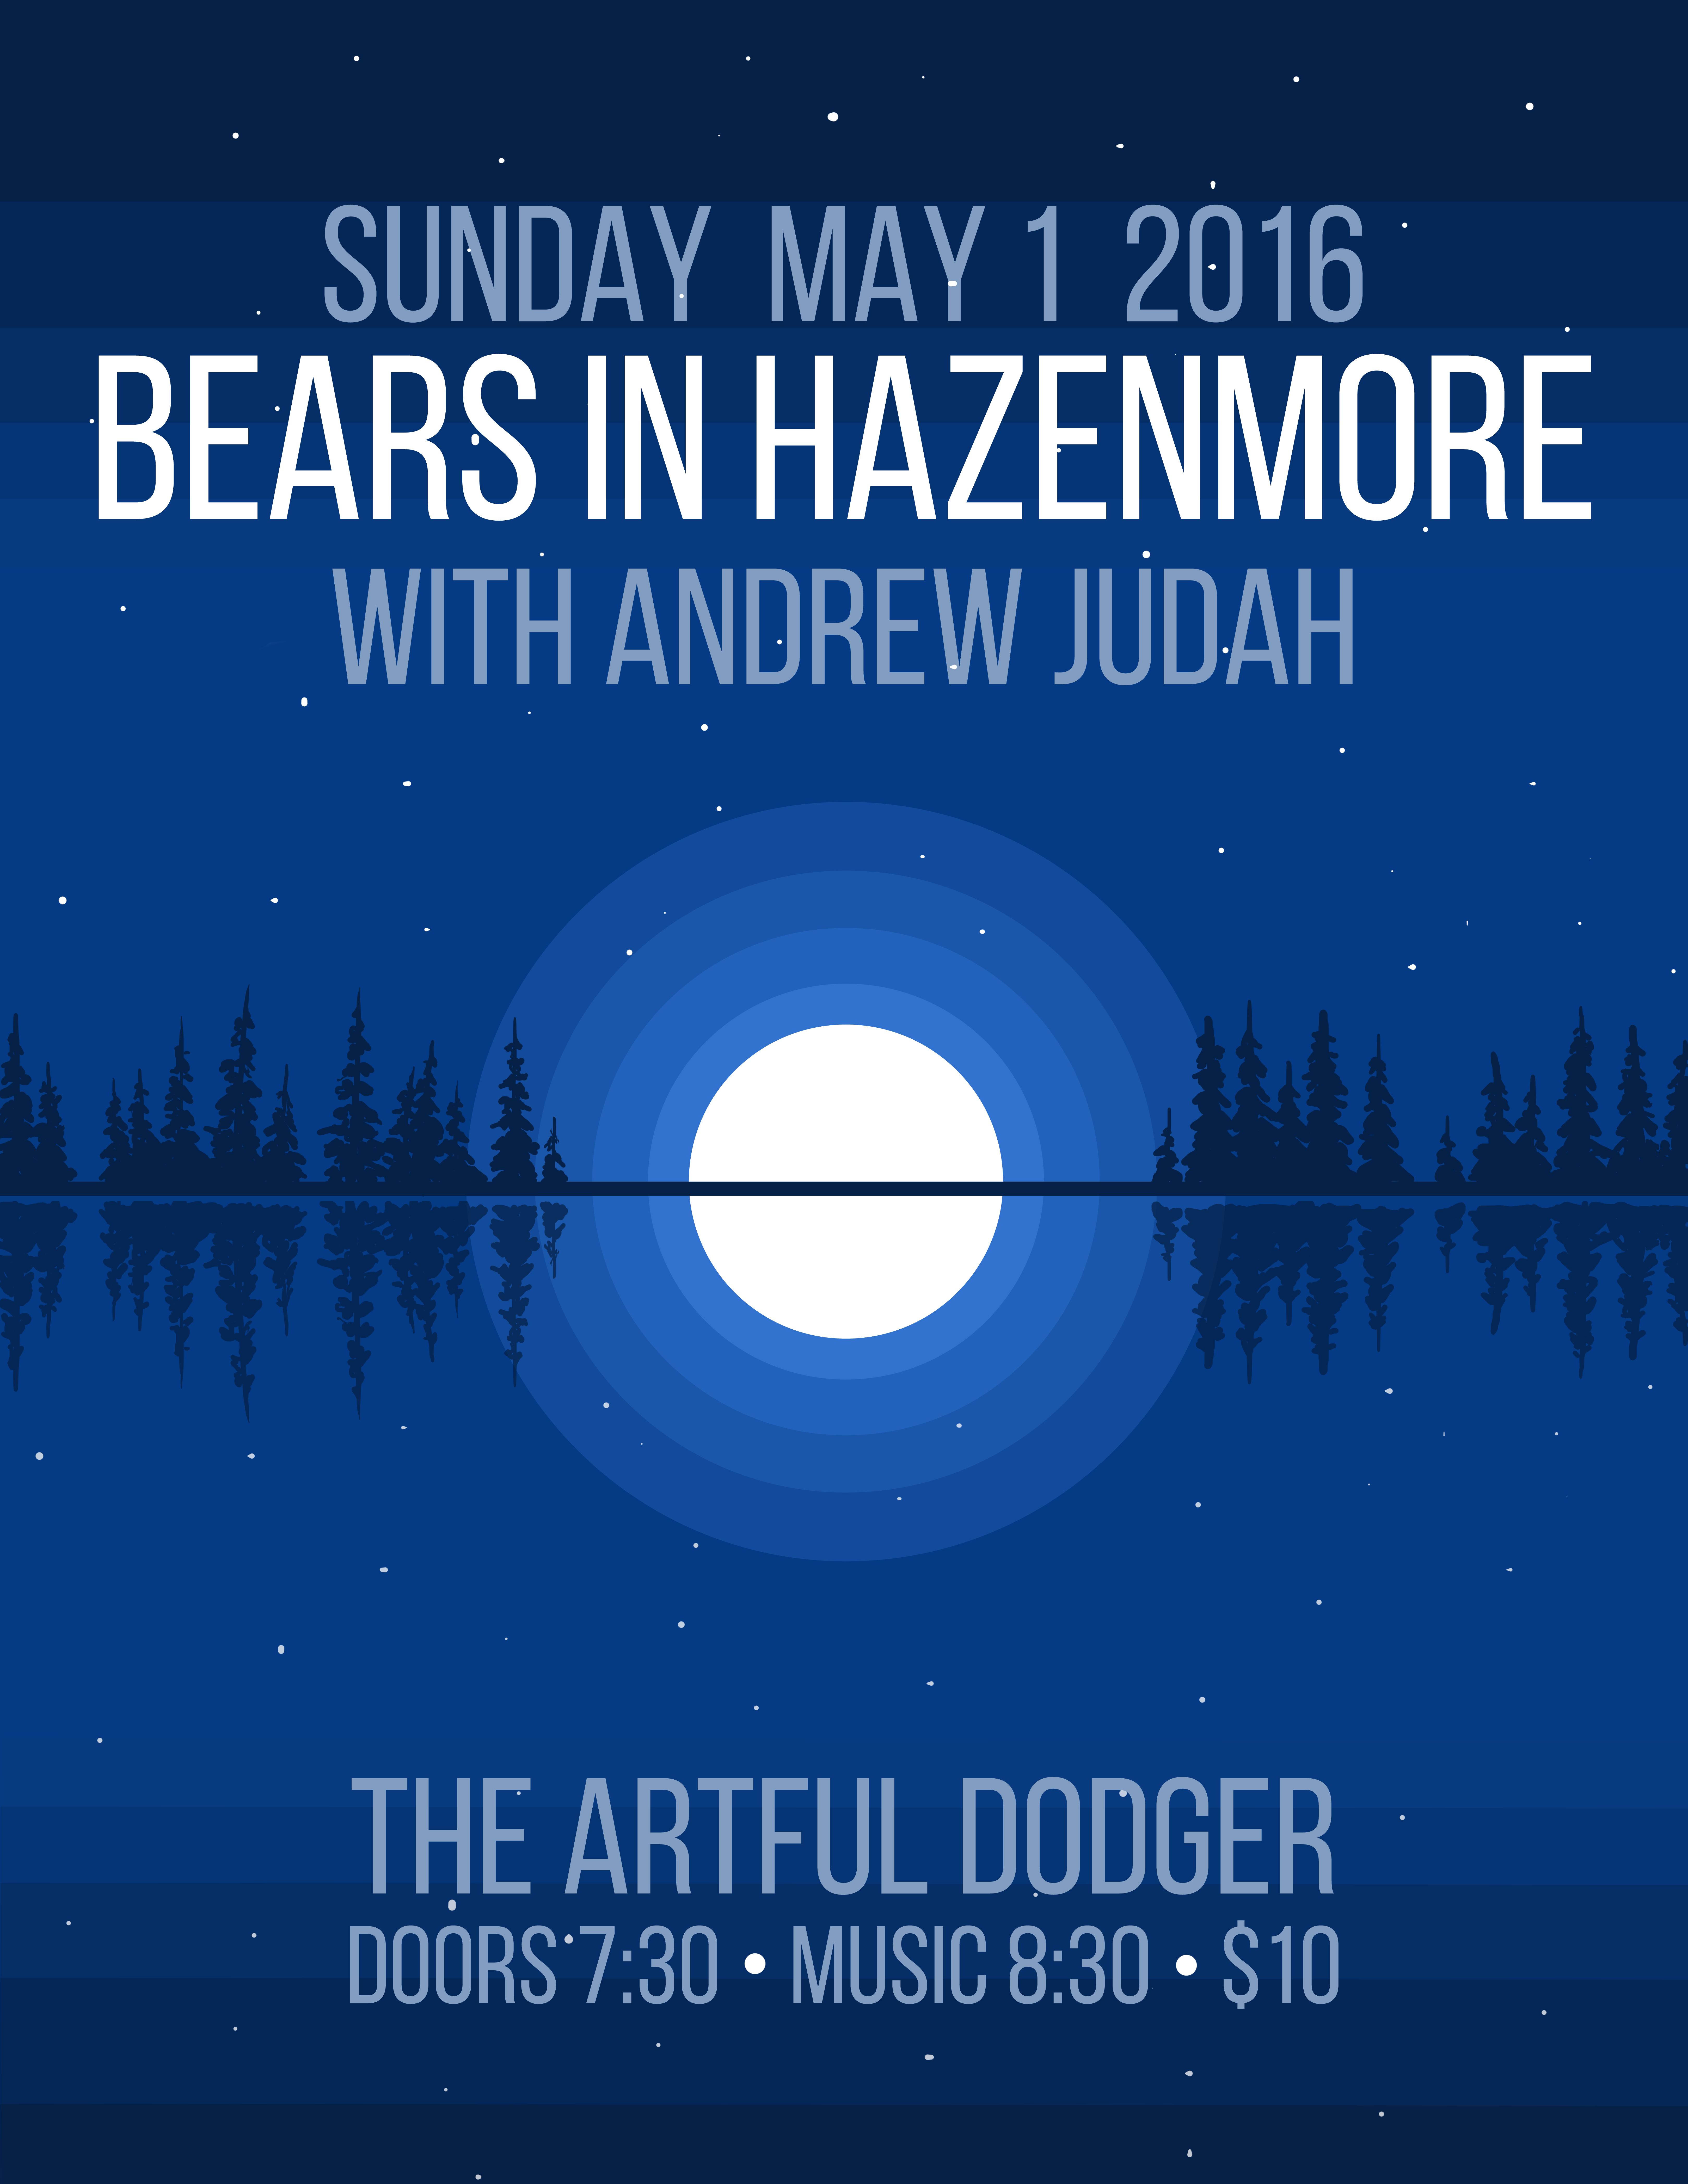 Bears in Hazenmore Poster, May 2016